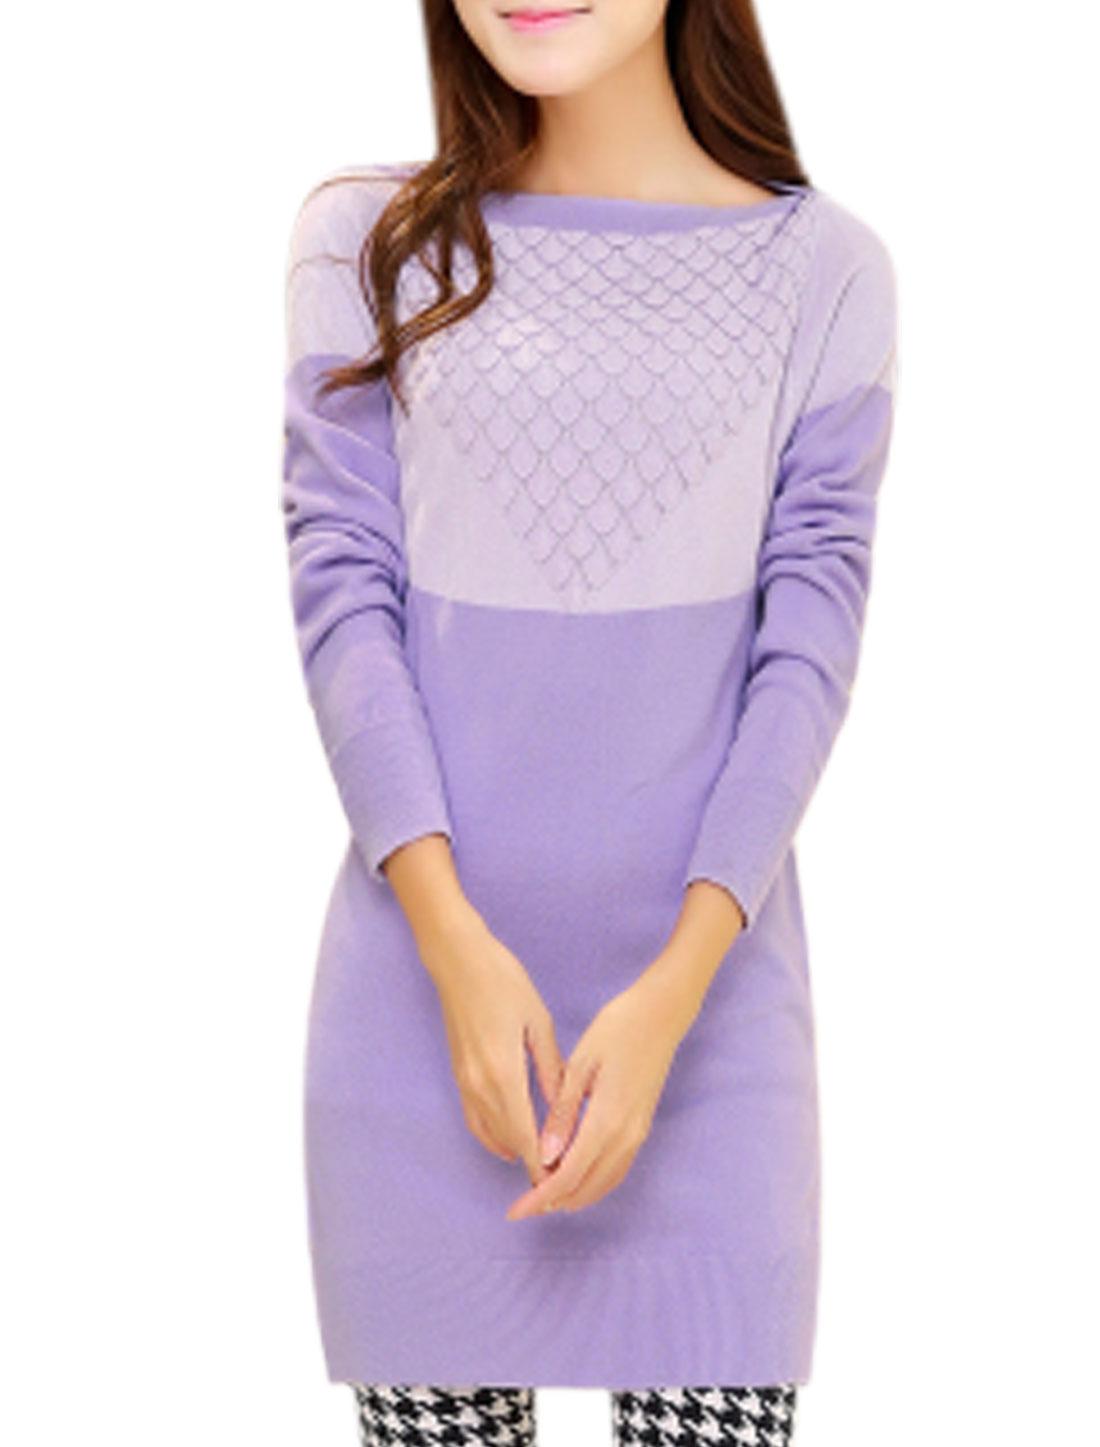 Women Contrast Color Boat Neck Tunic Leisure Knit Top Light Violet Lilac S